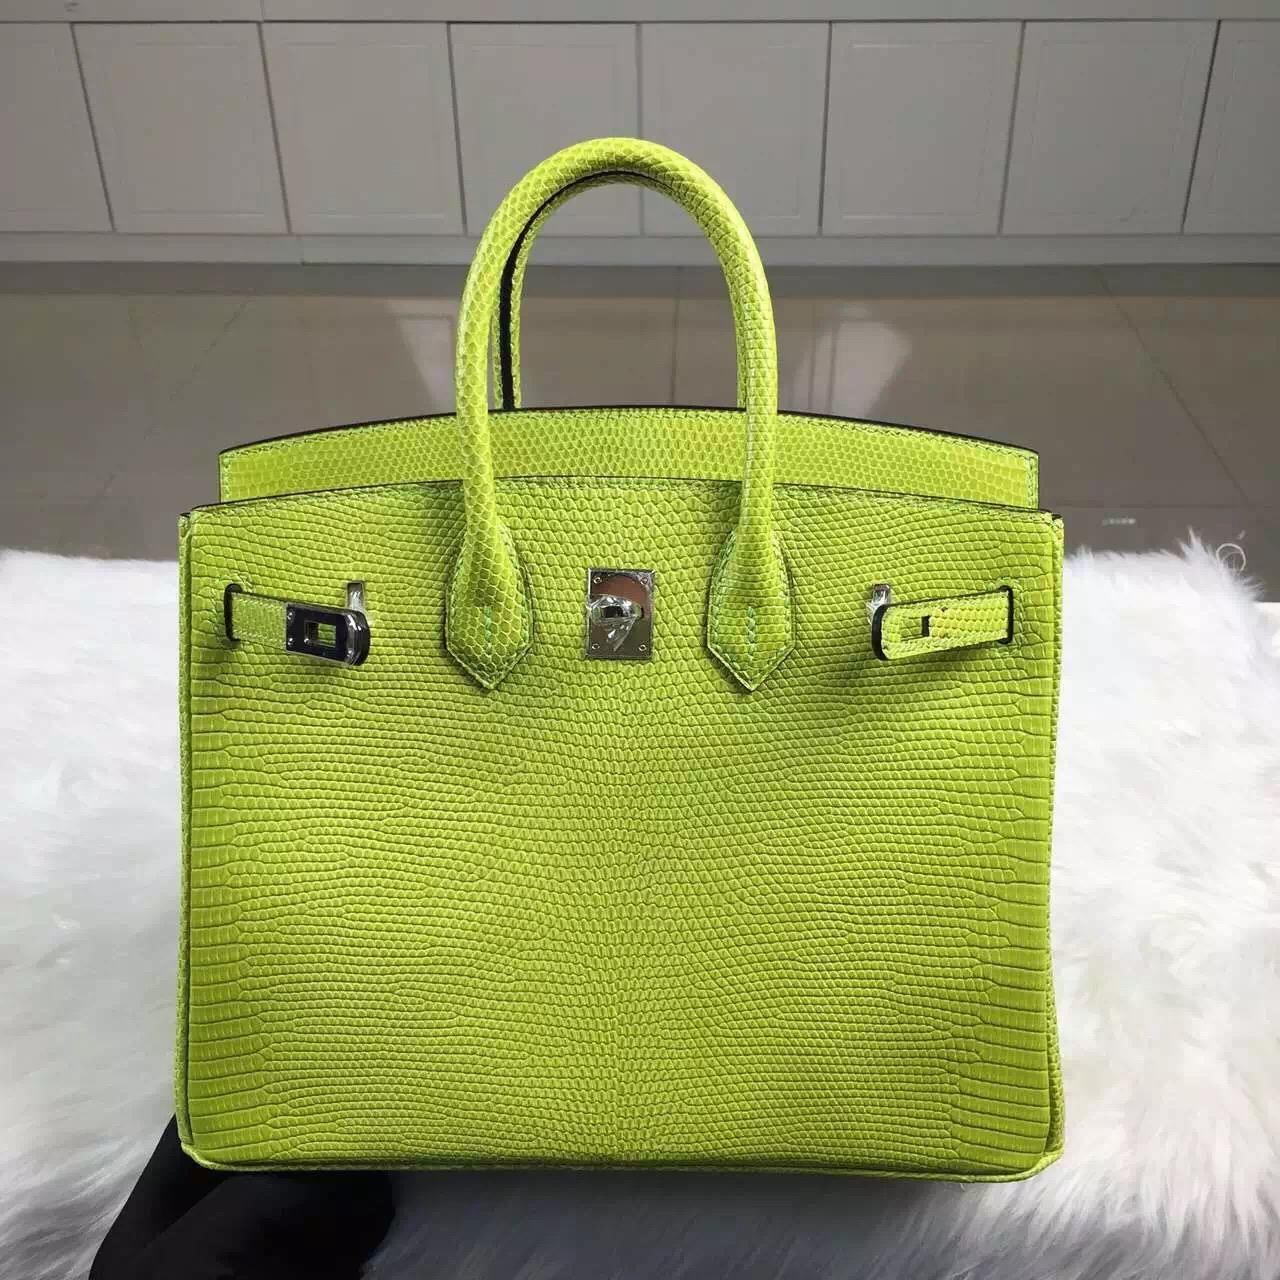 High Quality Hermes 6R Kiwi Green Lizard Skin Leather Birkin Bag25cm Silver Hardware